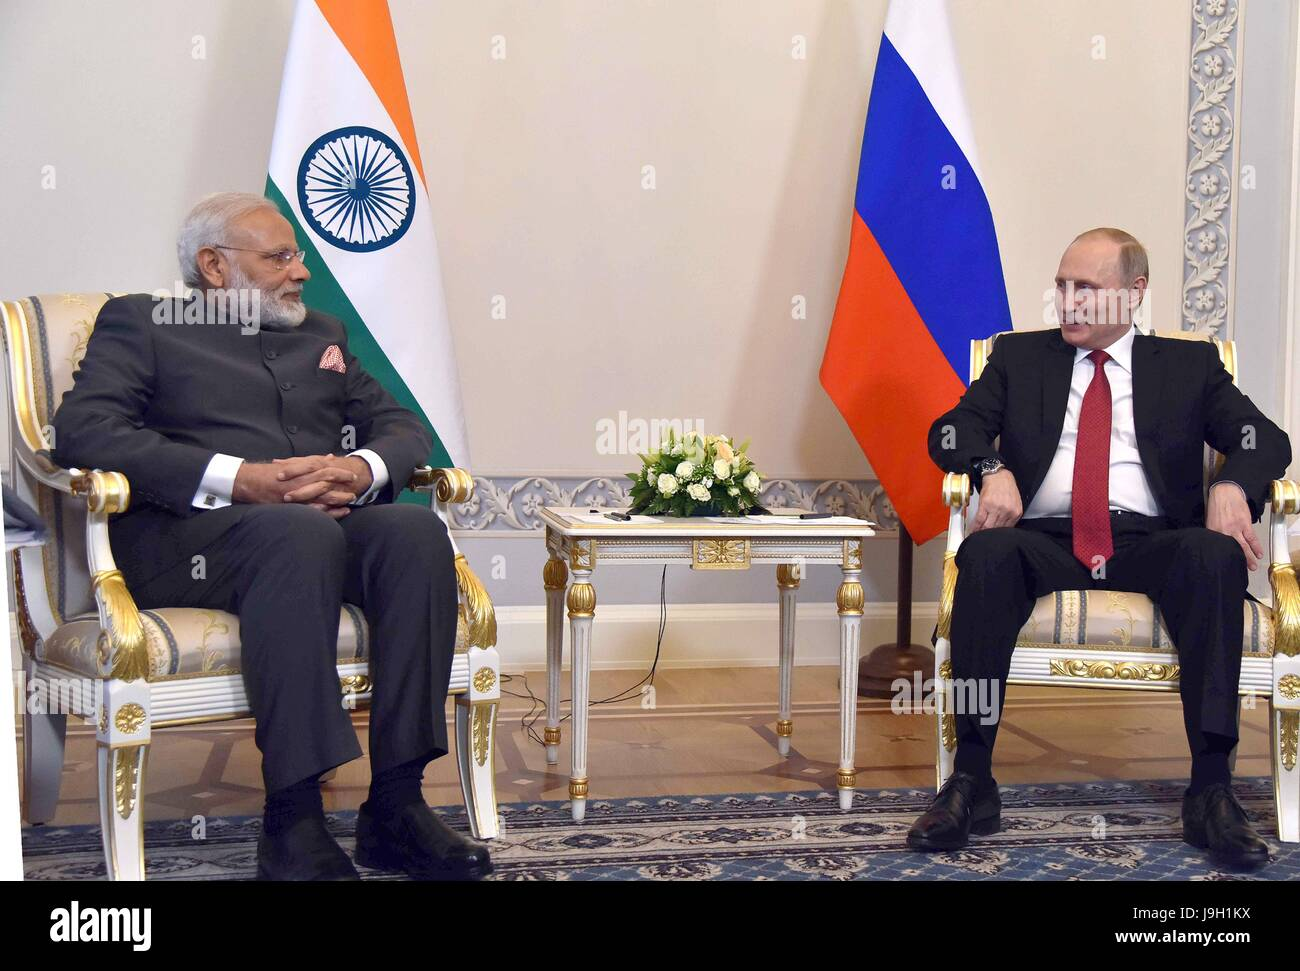 Indian Prime Minister Narendra Modi, left, during a bilateral meeting with Russian President Vladimir Putin at Konstantin - Stock Image